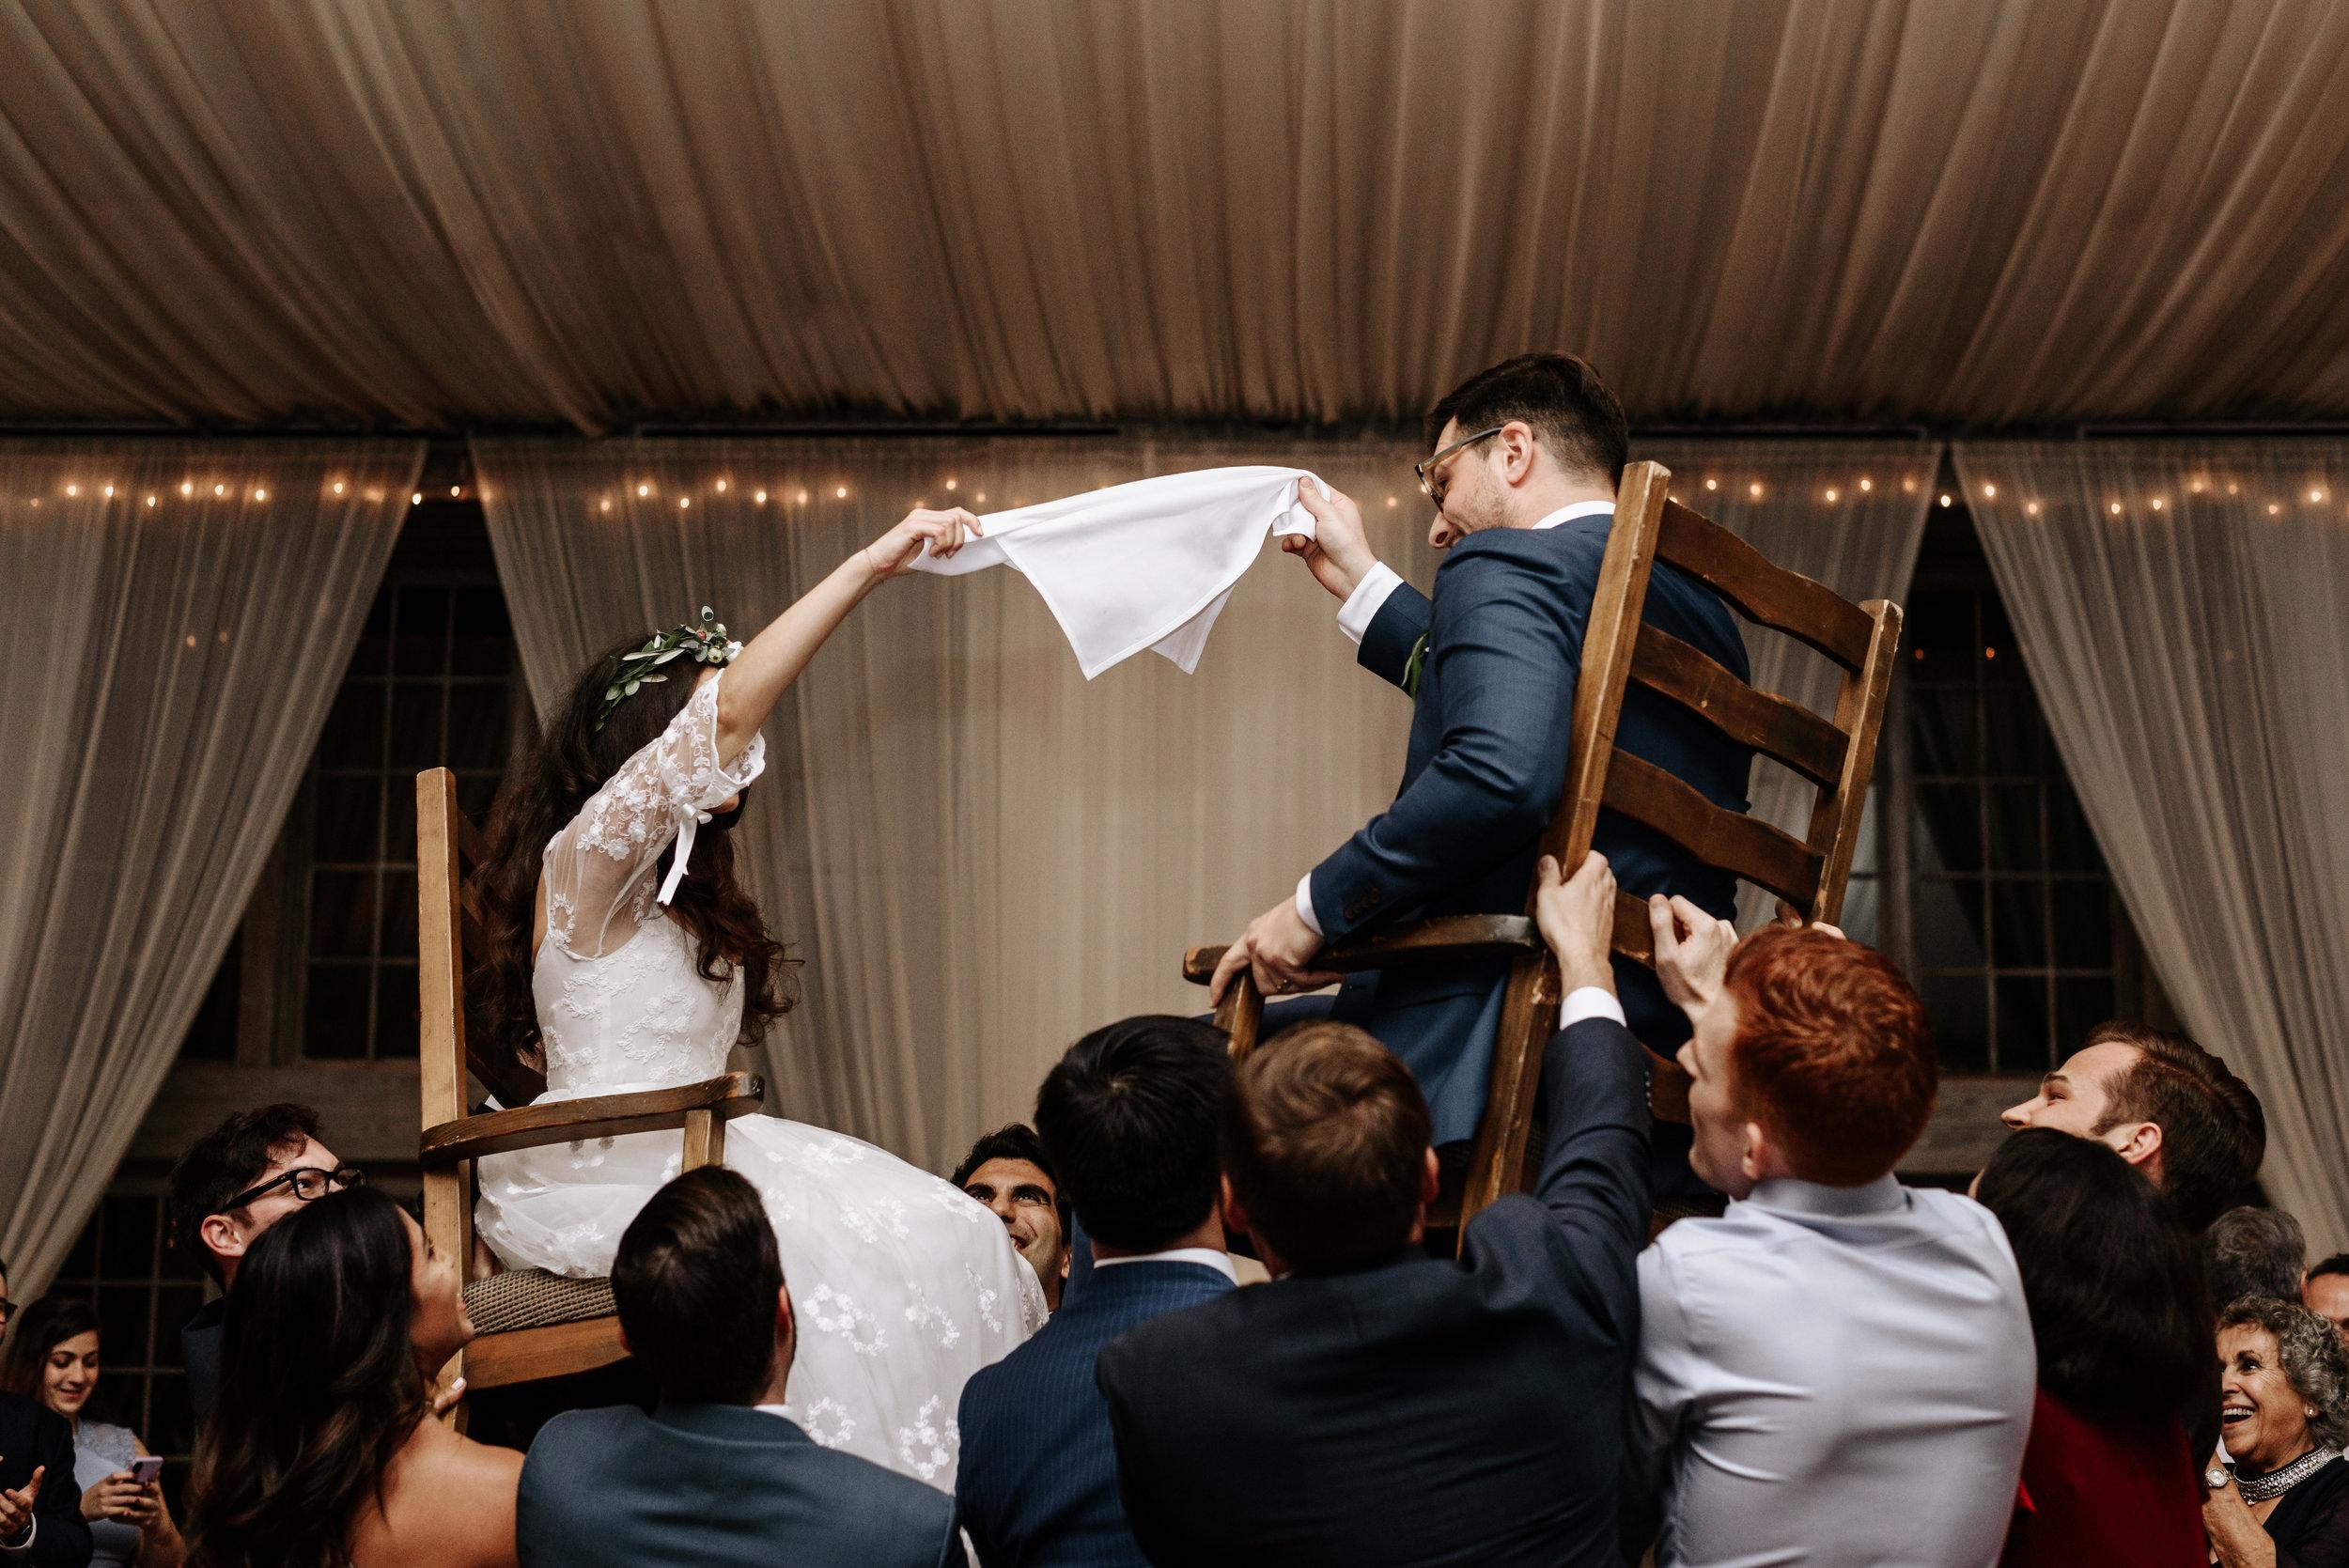 Veritas-Vineyards-and-Winery-Wedding-Photography-Afton-Virginia-Yasmin-Seth-Photography-by-V-3280.jpg